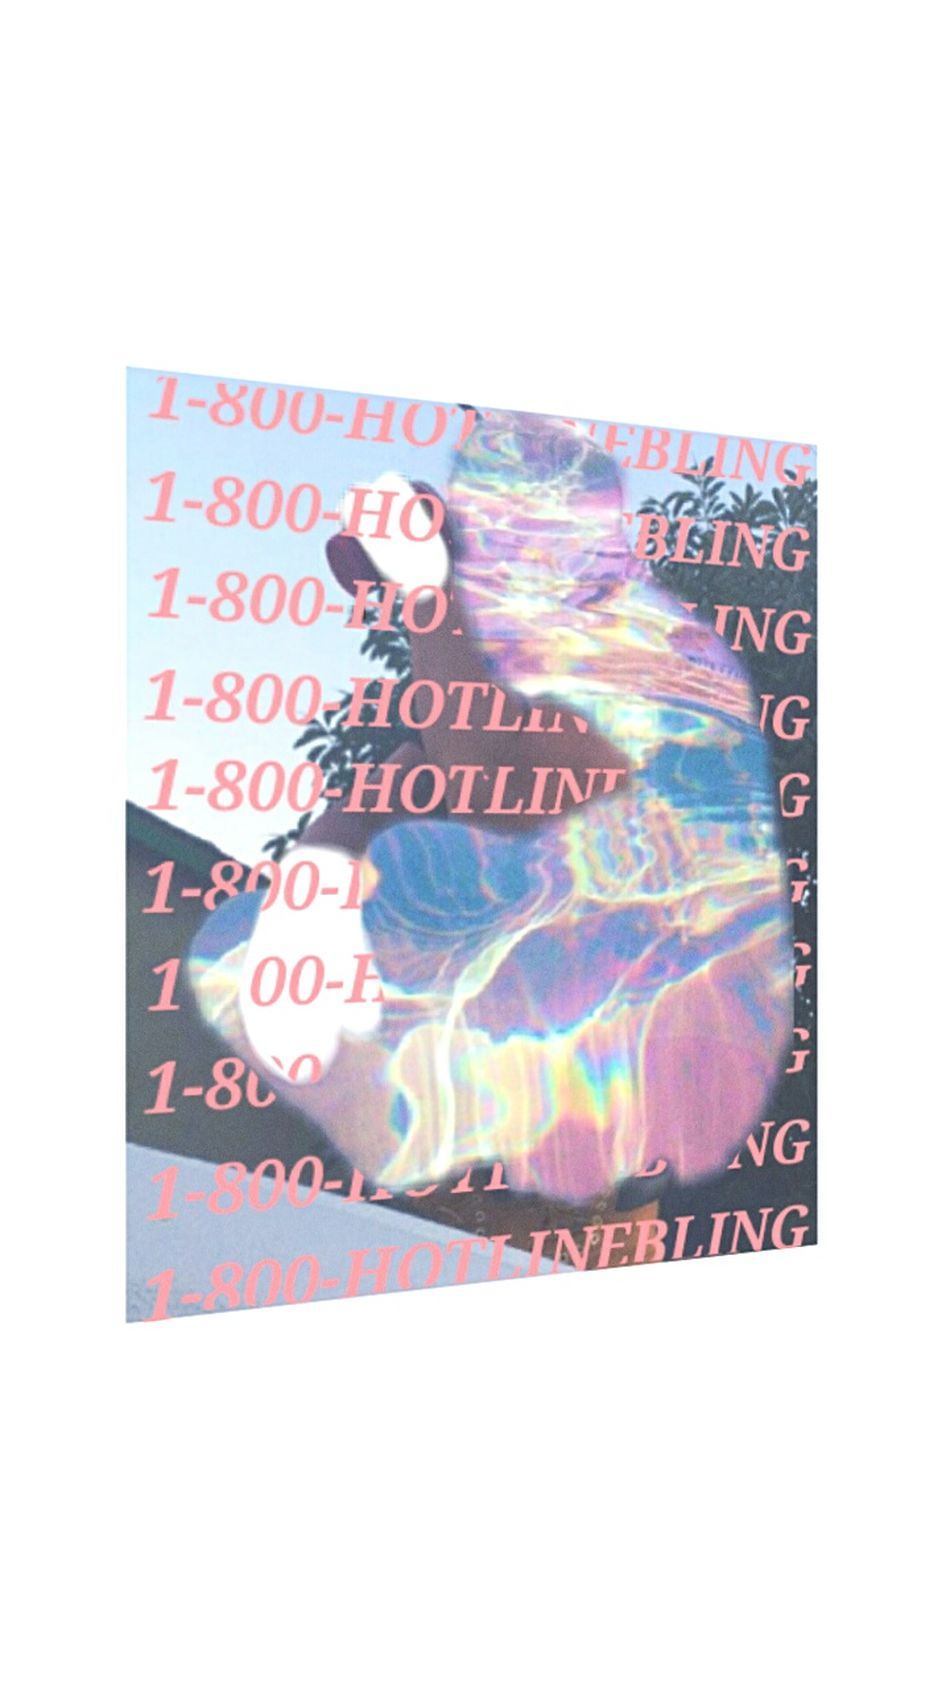 Hotline Bling Drake  6ix .doG Designs